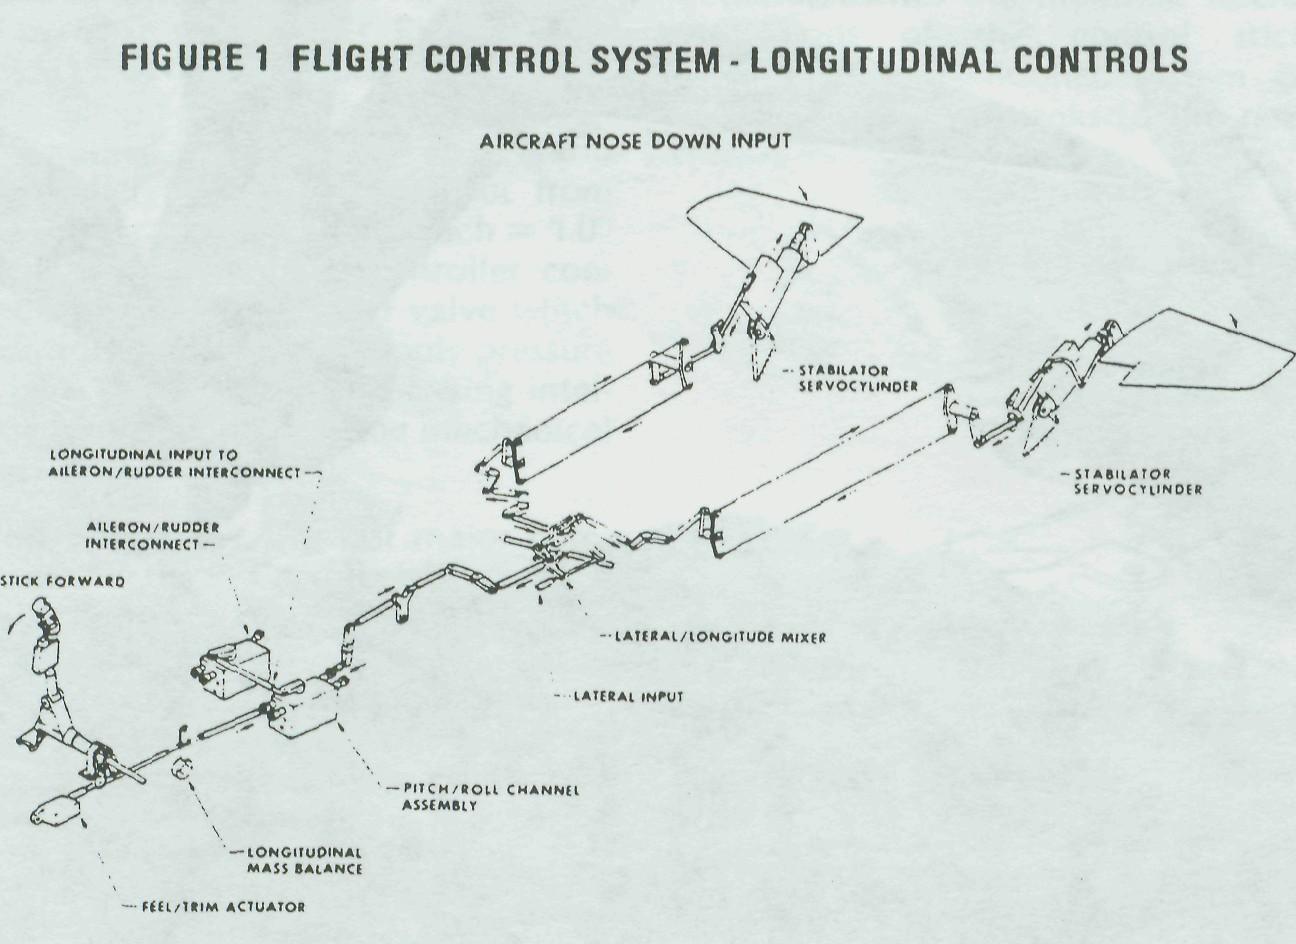 F 15 Longitudinal Control